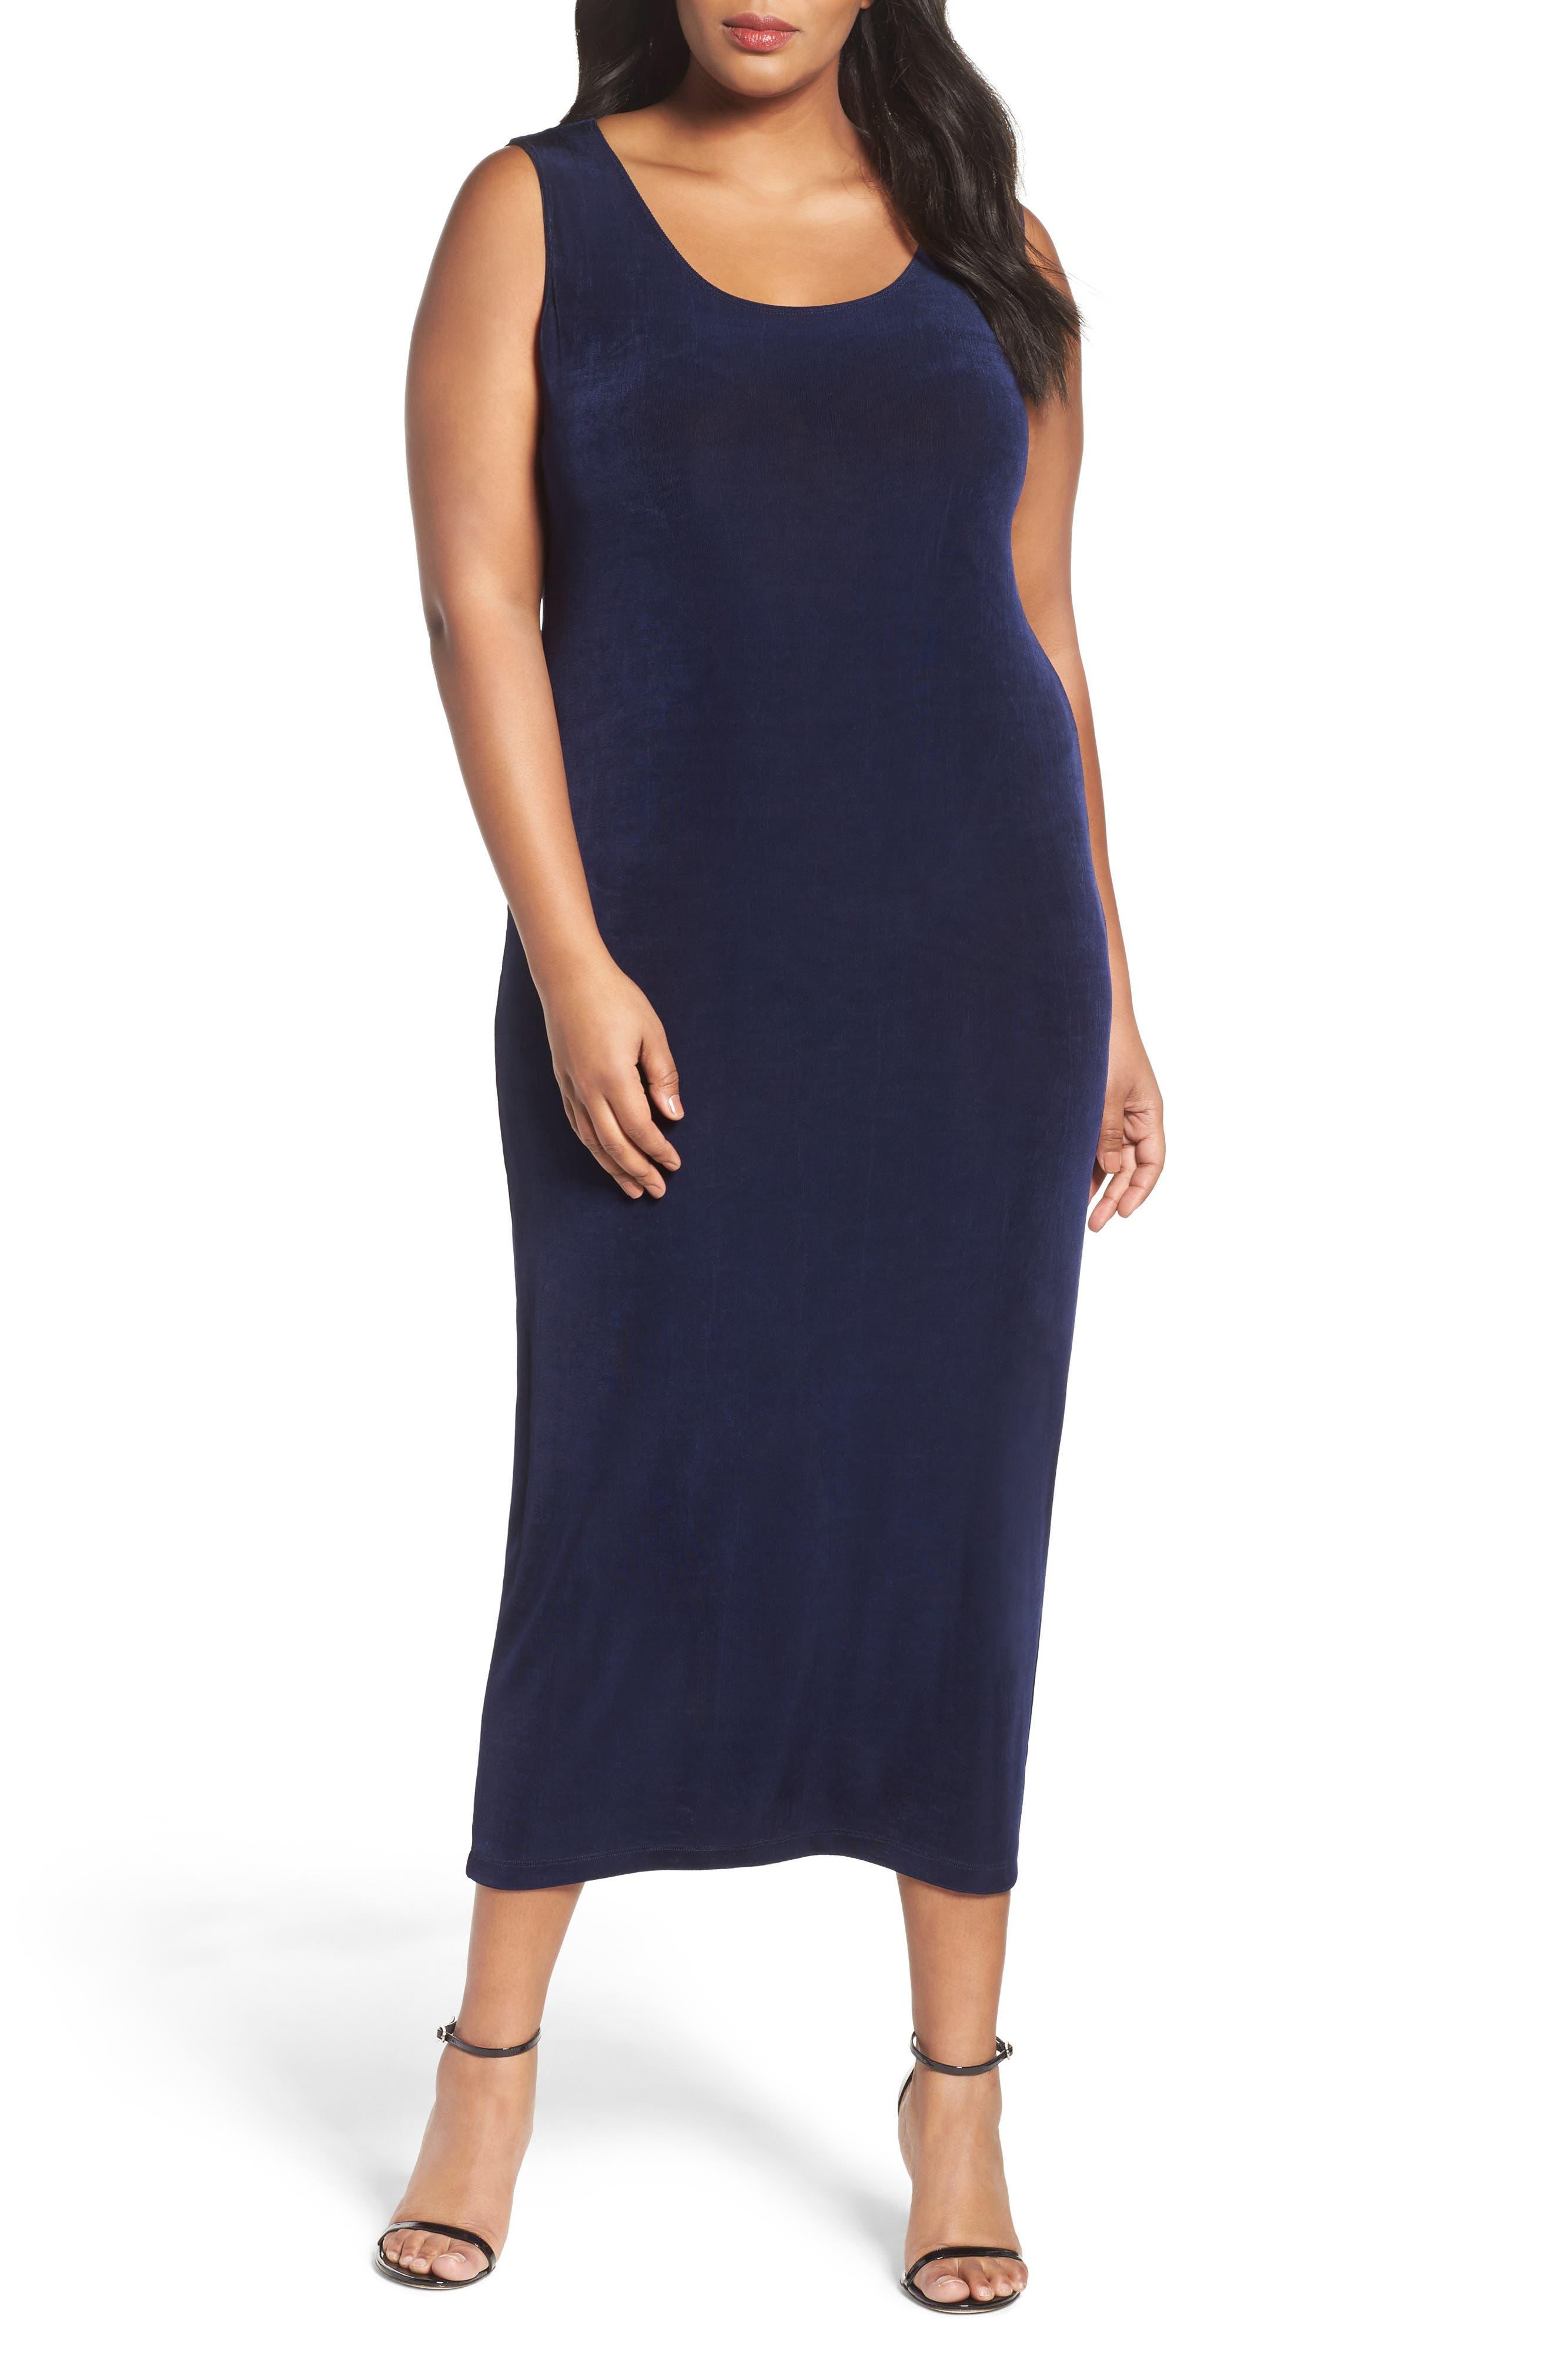 VIKKI VI,                             Sleeveless Maxi Tank Dress,                             Main thumbnail 1, color,                             NAVY